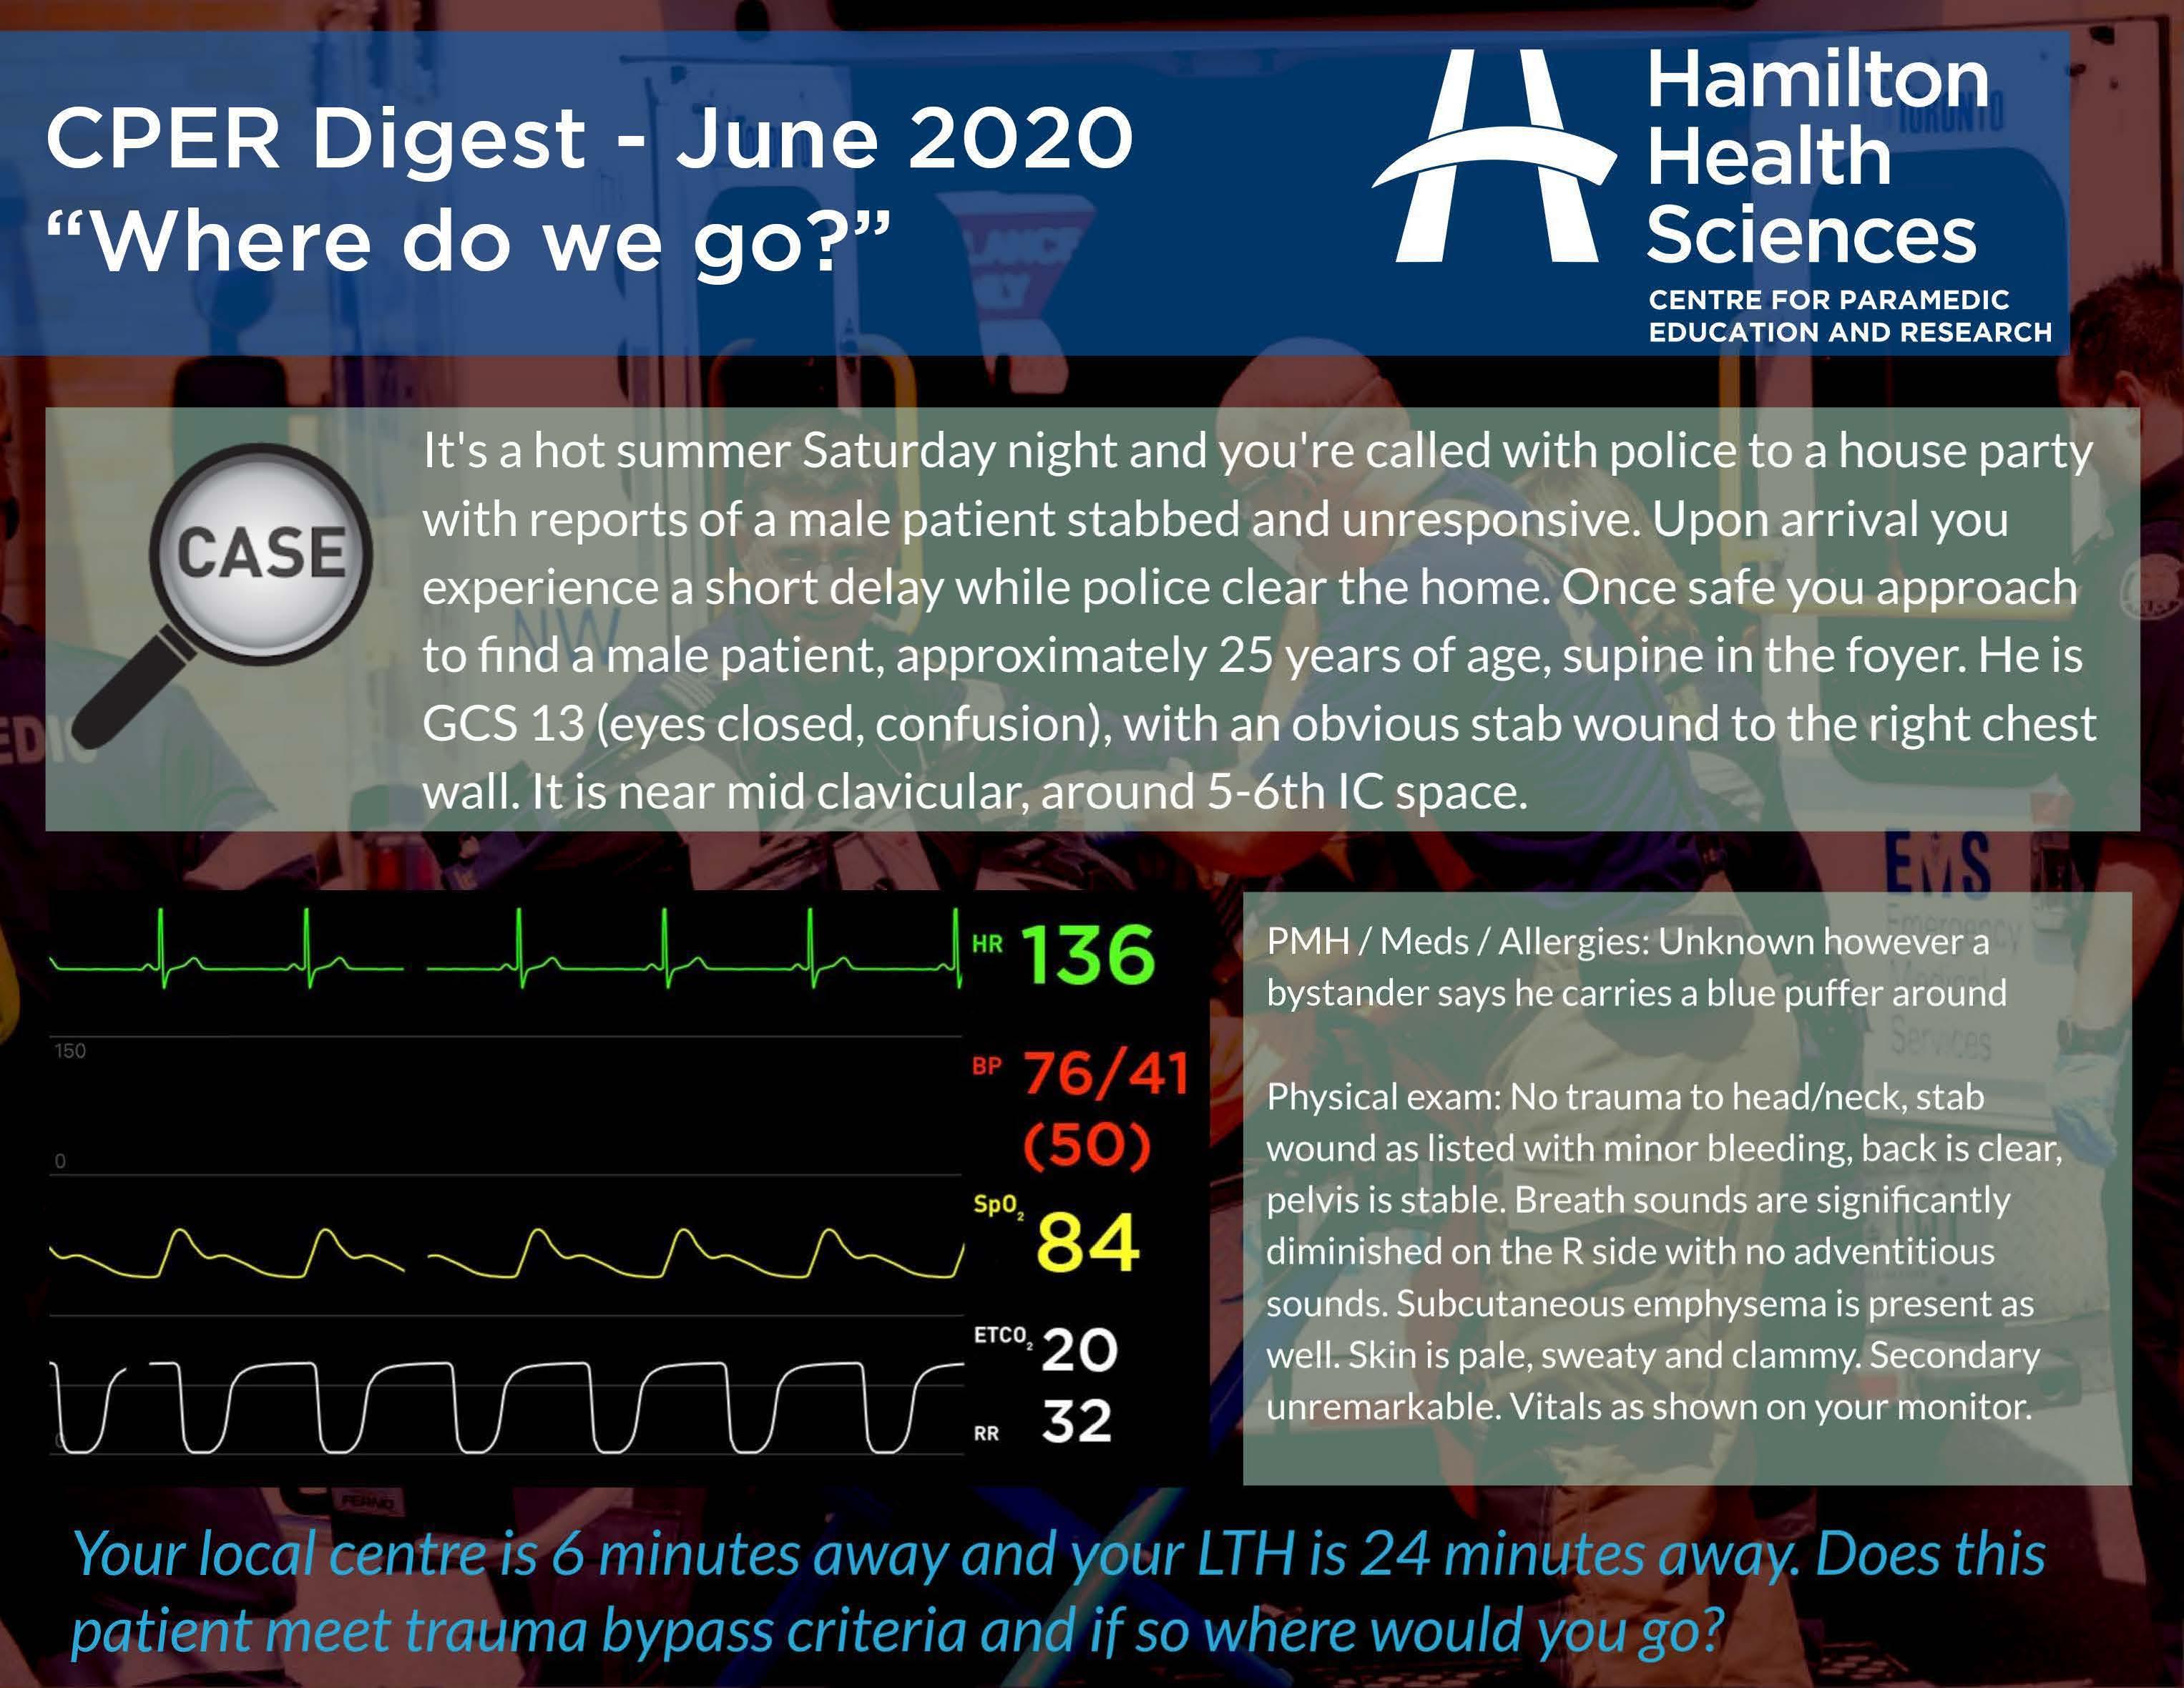 CPER Digest June 2020 FINAL Page 1